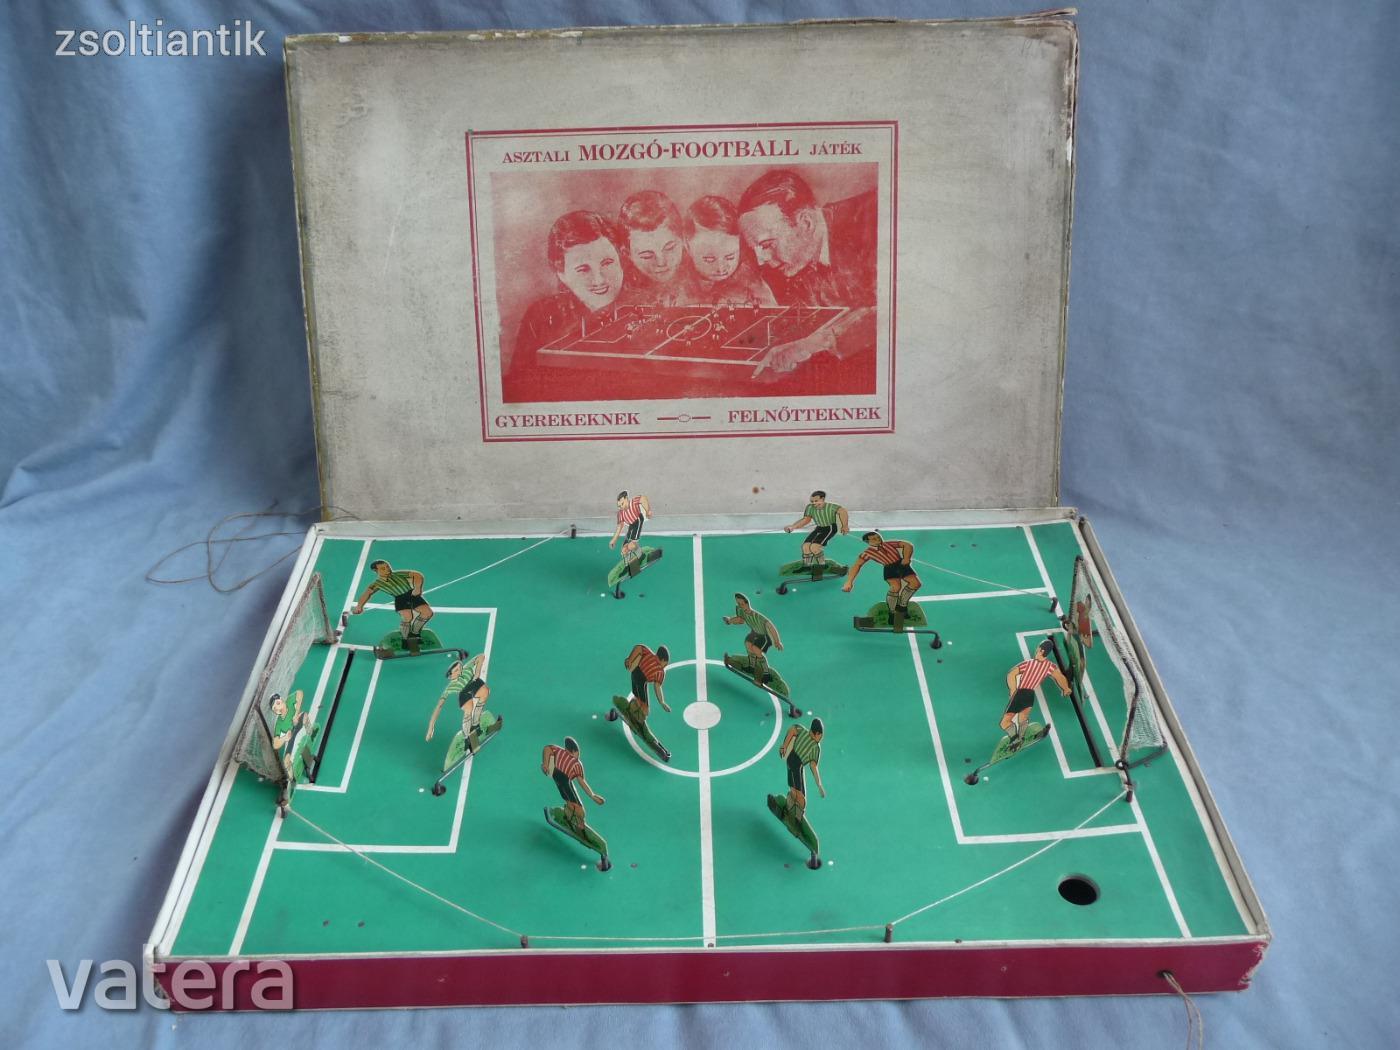 antik-tarsasjatek-asztali-foci-mozgo-football-tihanyi-szabadalom-kolozsvar-2-vh-idejebol-ritka-95ea_6_big.jpg